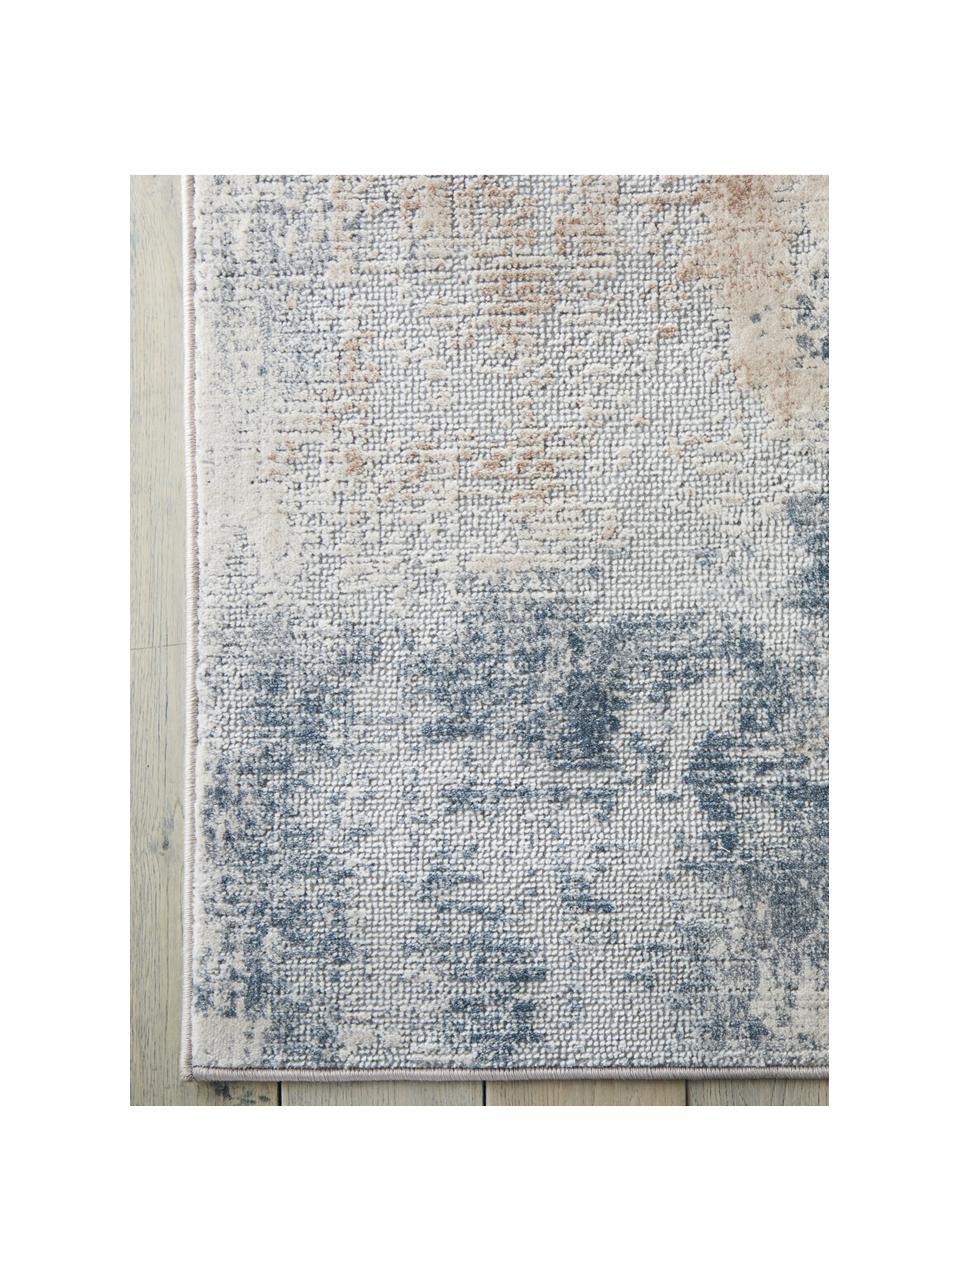 Tappeto di design beige/grigio Rustic Textures II, Retro: 50%juta, 50%lattice, Tonalità beige, grigio, Larg. 240 x Lung. 320 cm (taglia L)